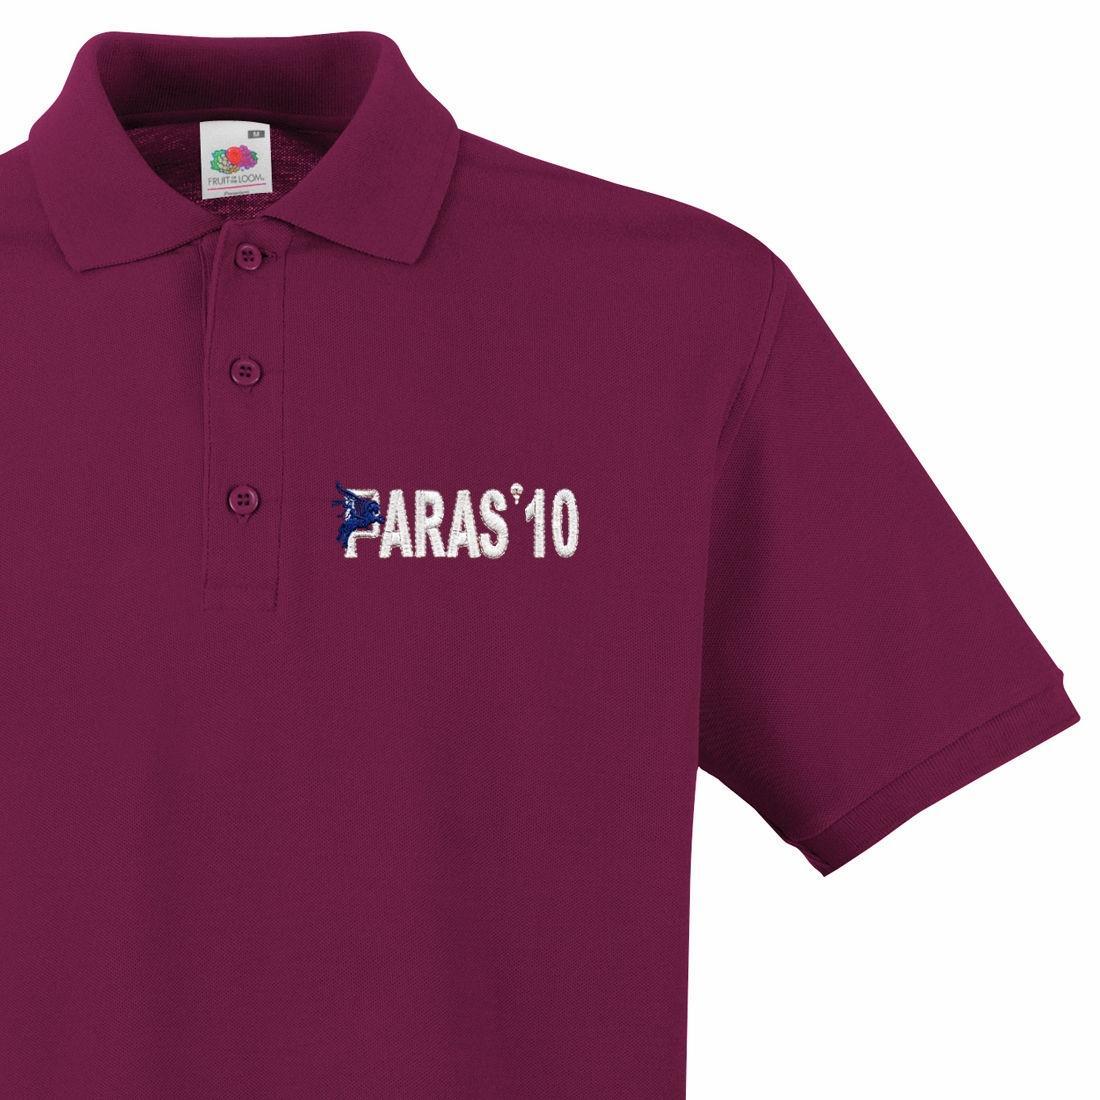 *CLEARANCE* Polo Shirt, Small, Maroon, Paras 10